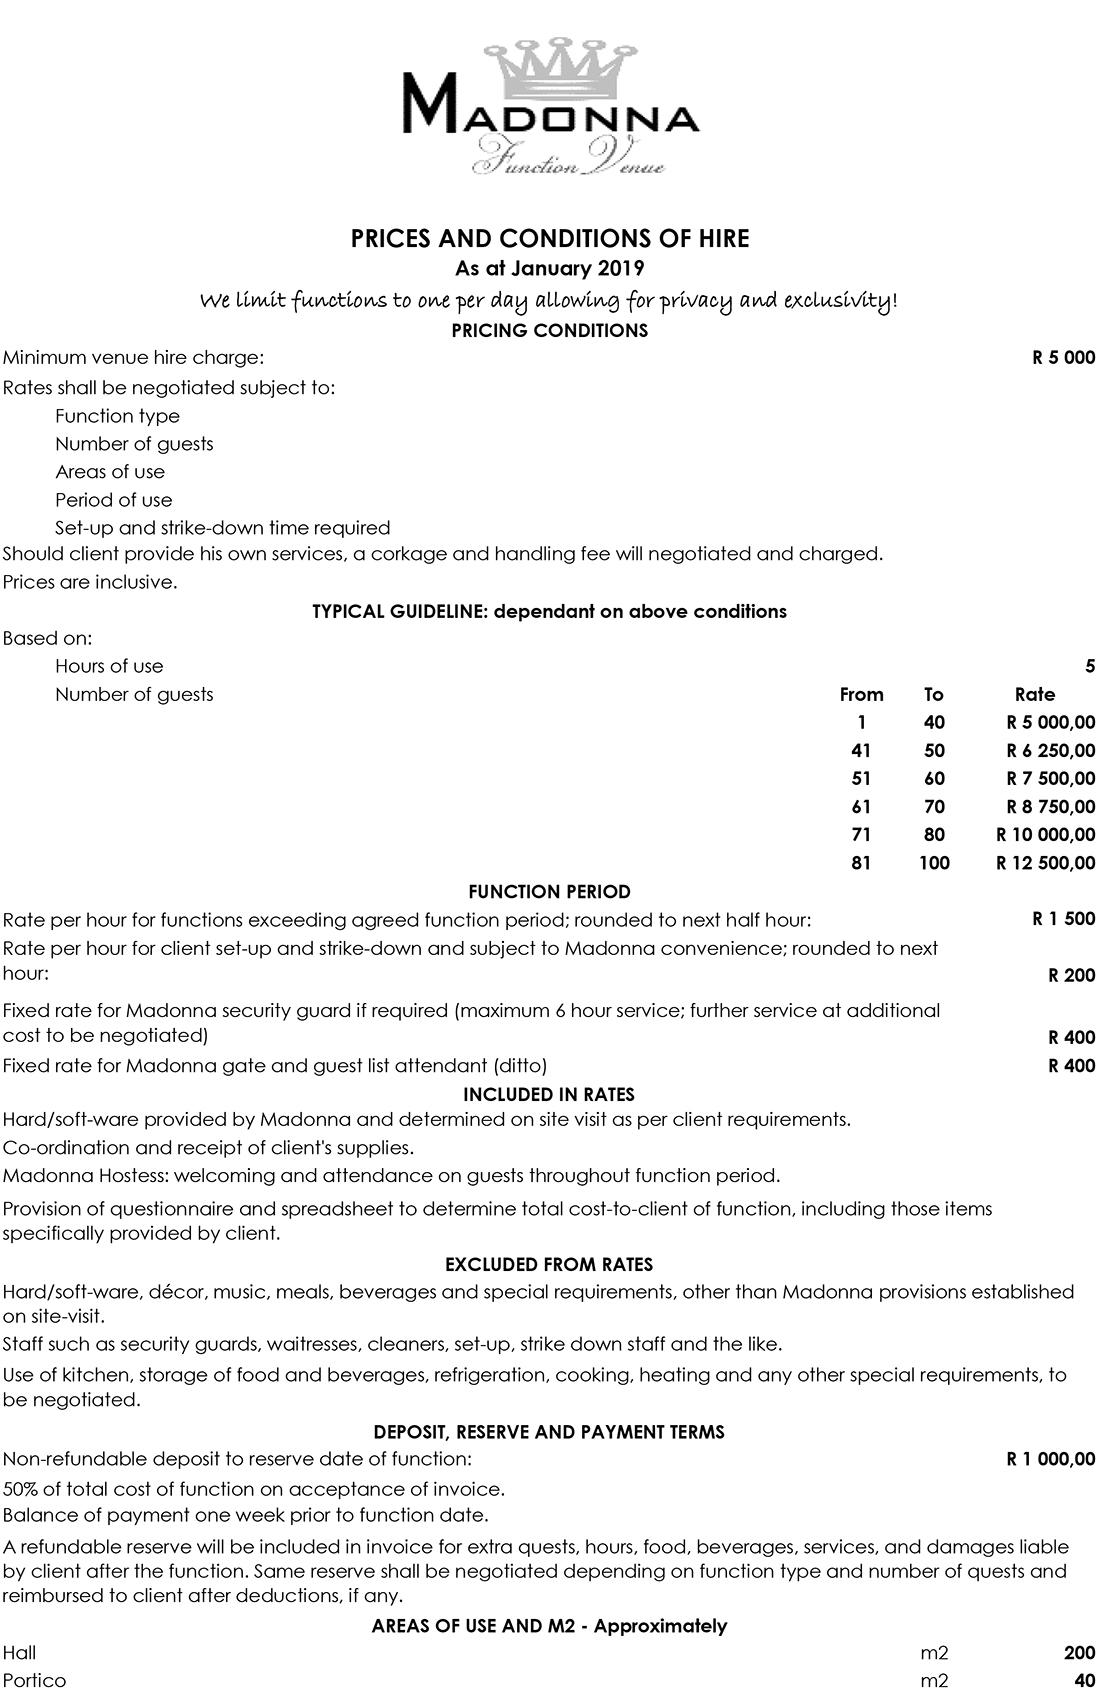 Bryanston Sandton Venue Function hire